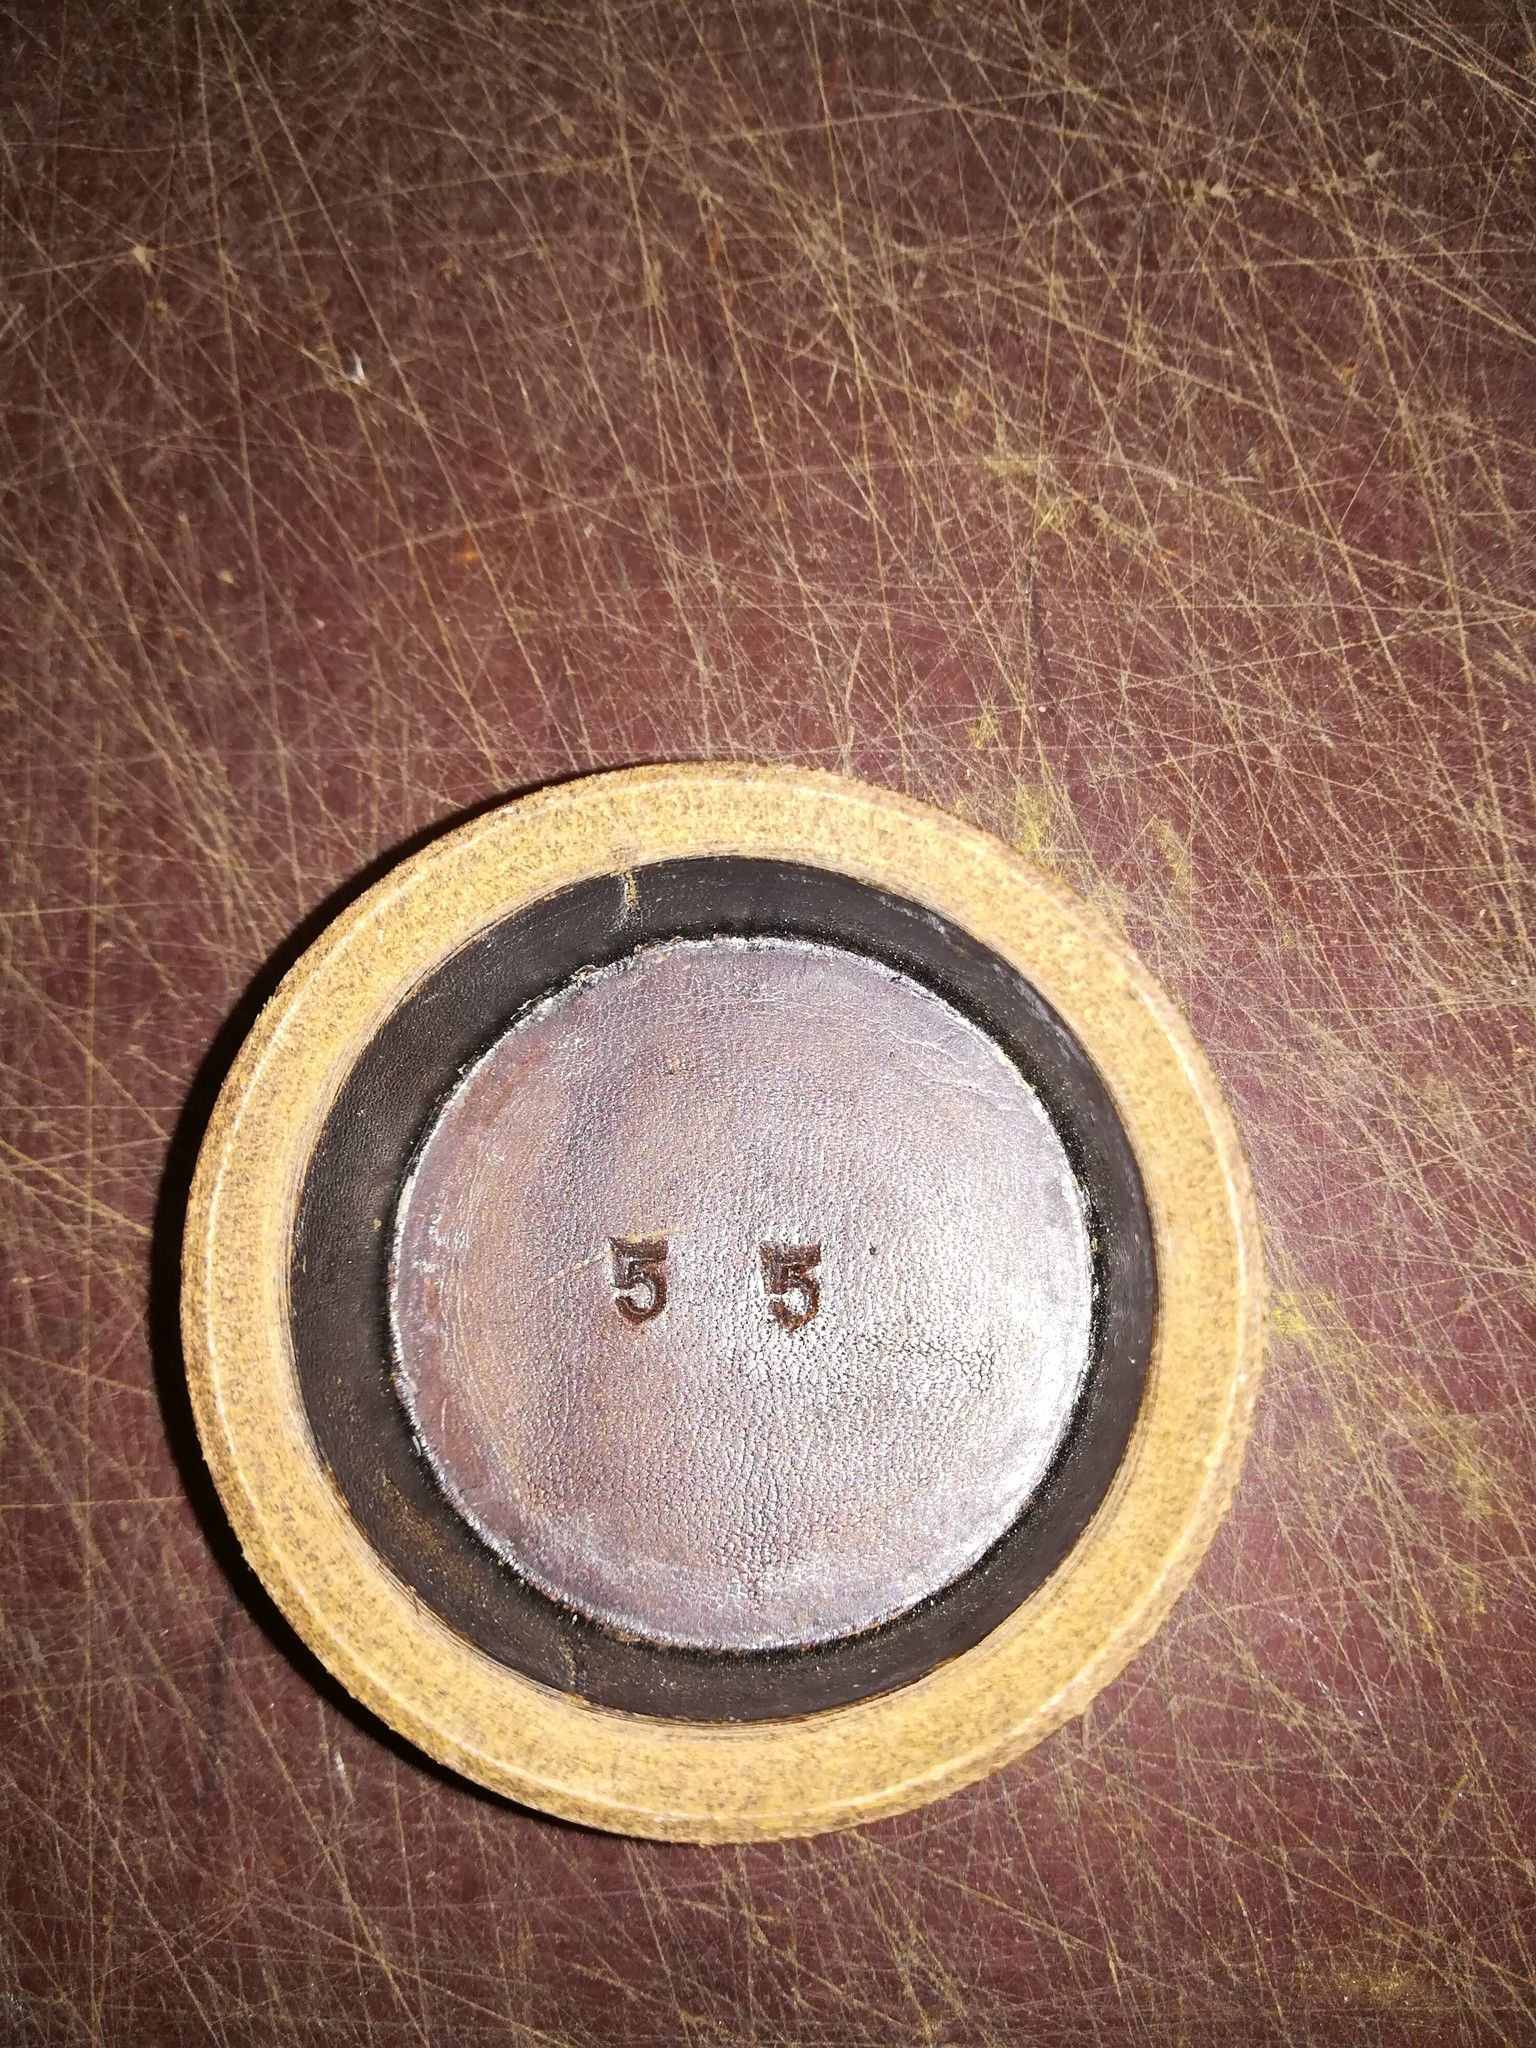 Calotta cuoio per pompa a mano ELEPHAS n. 1 Ø 55 mm